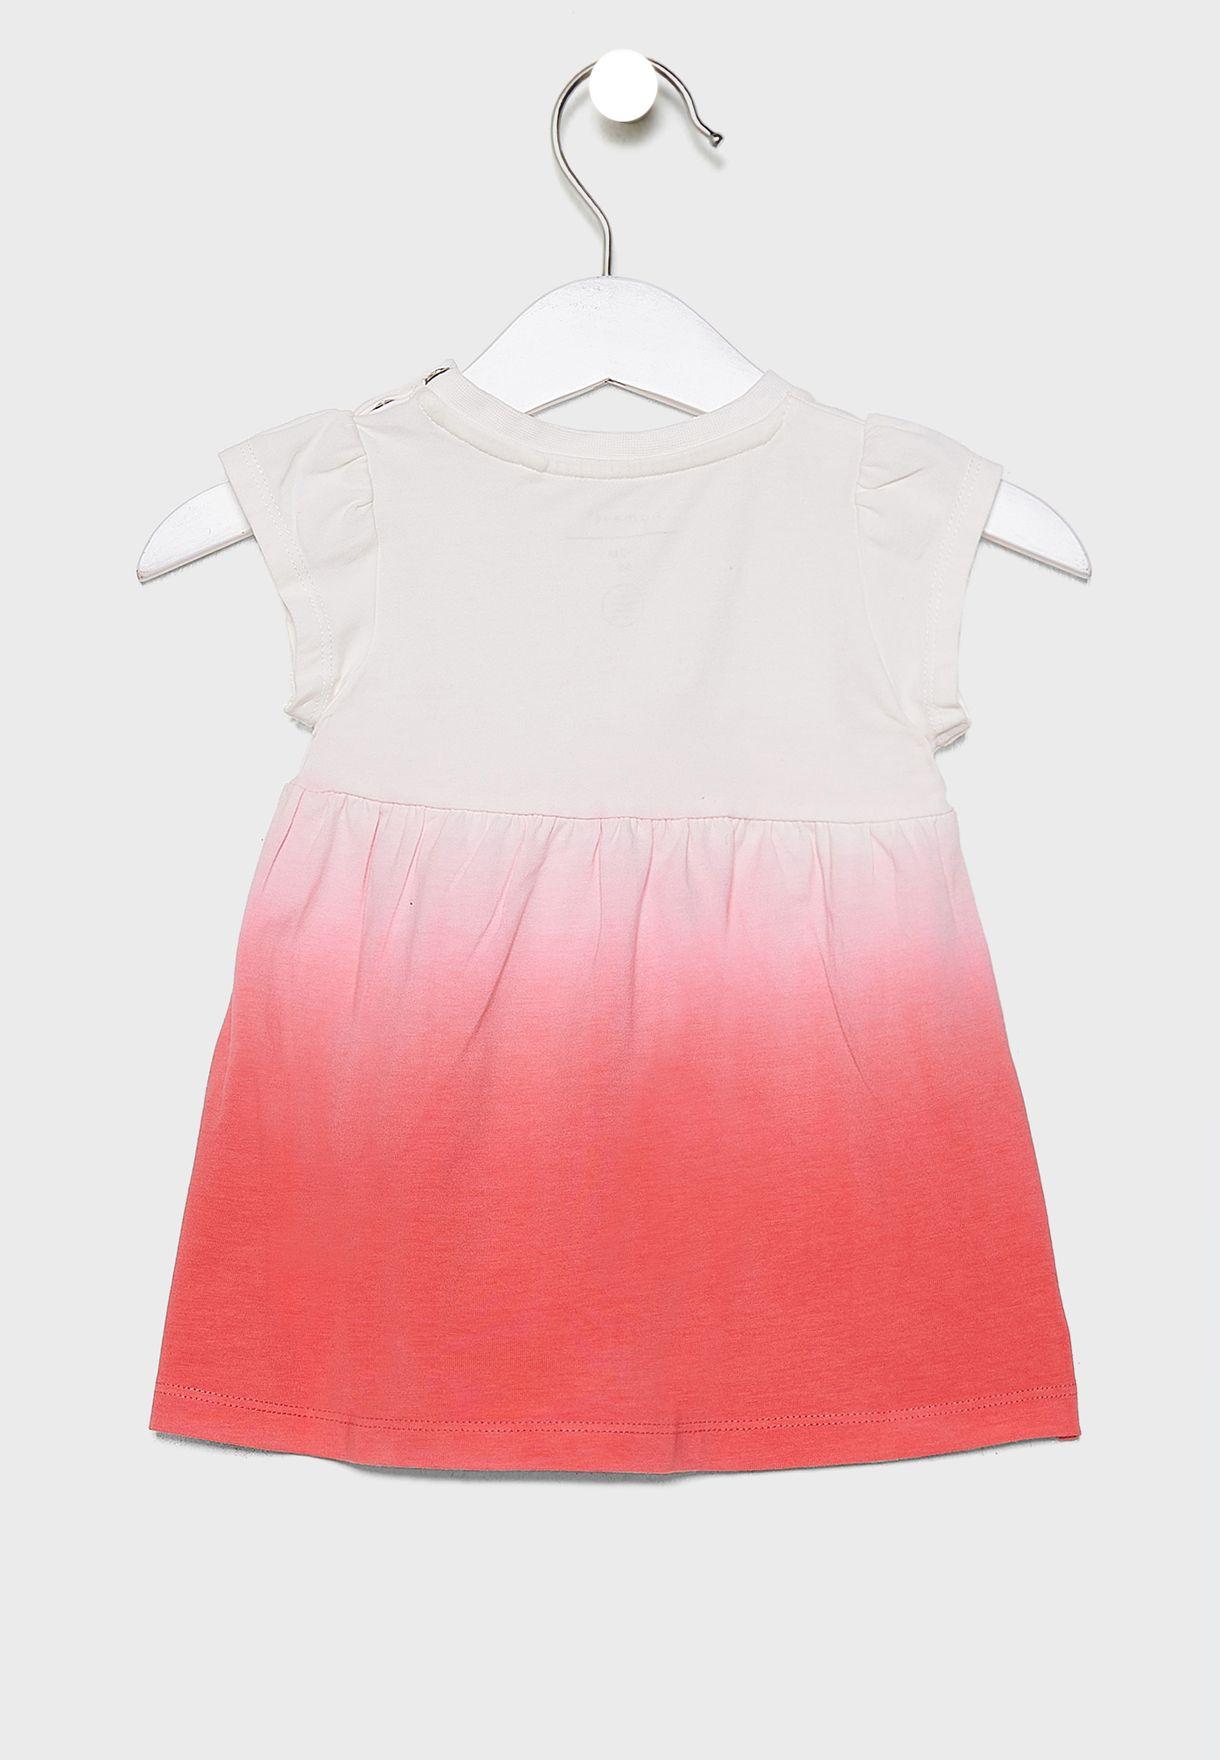 Kids Color Block Dress + Knicker Set